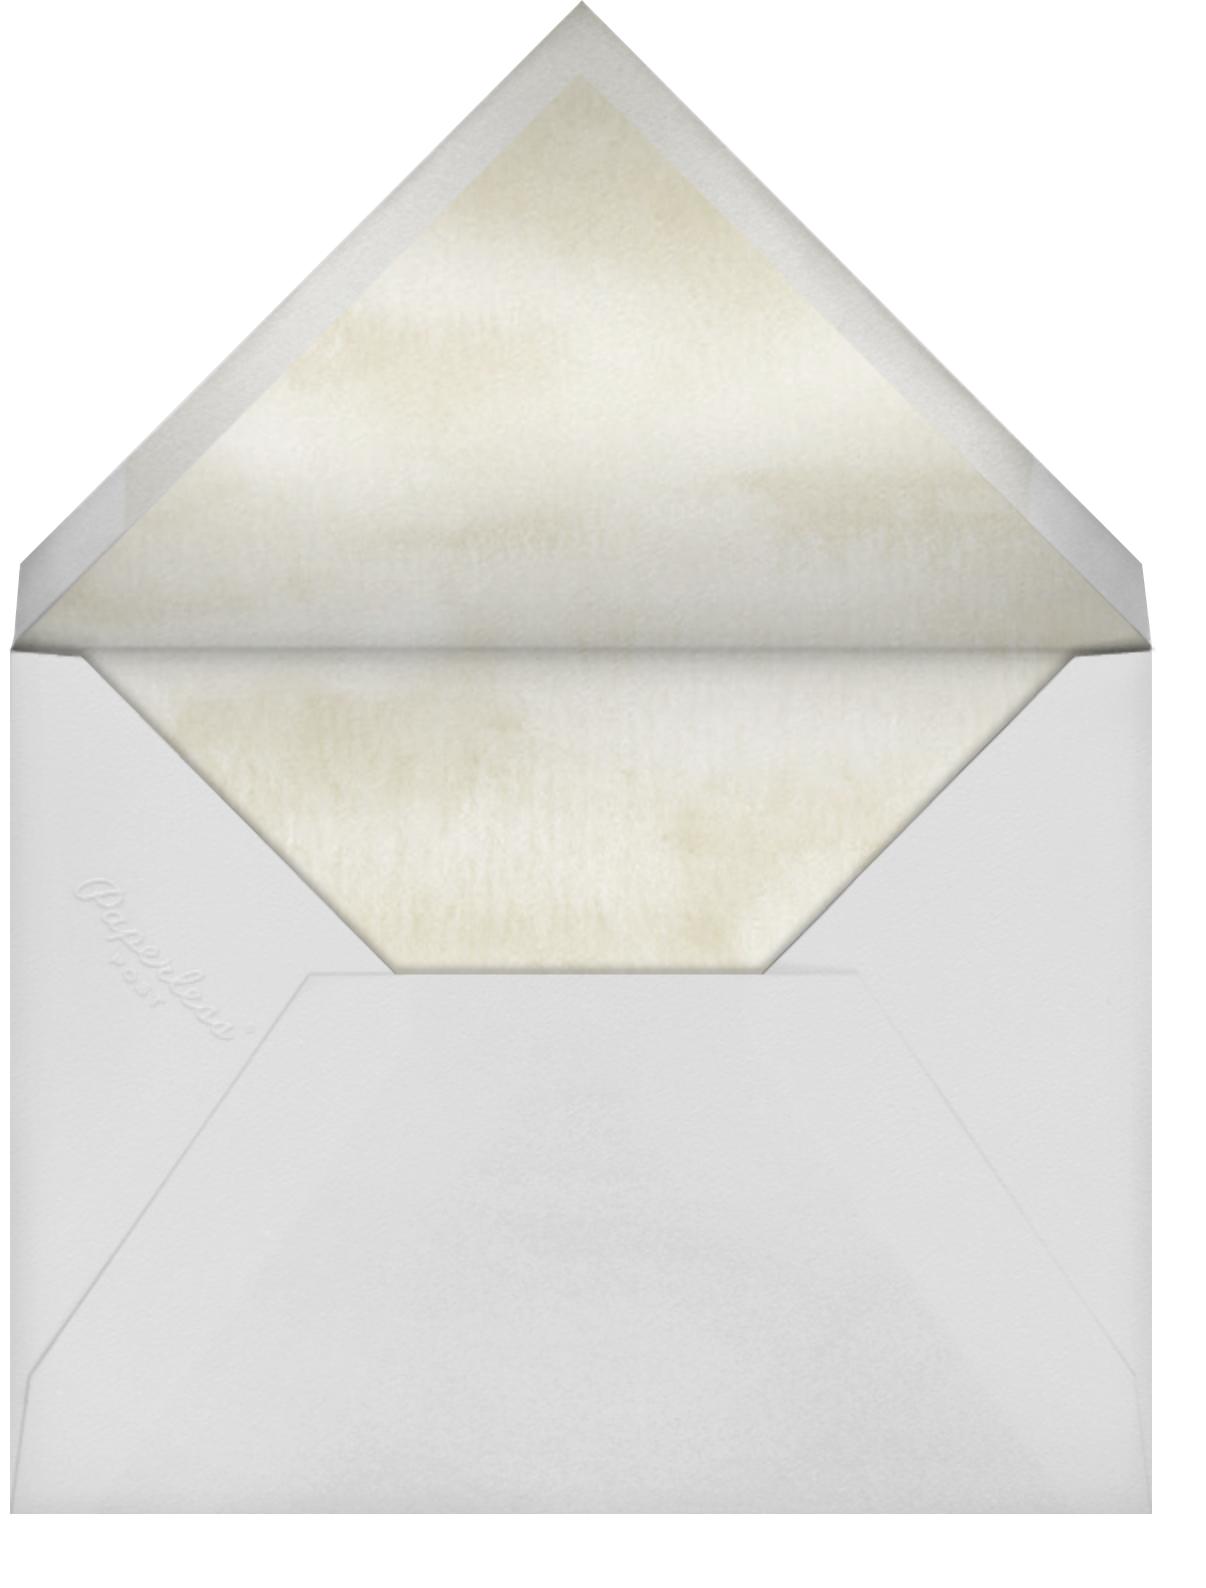 Buckhannon - Felix Doolittle - Adult birthday - envelope back